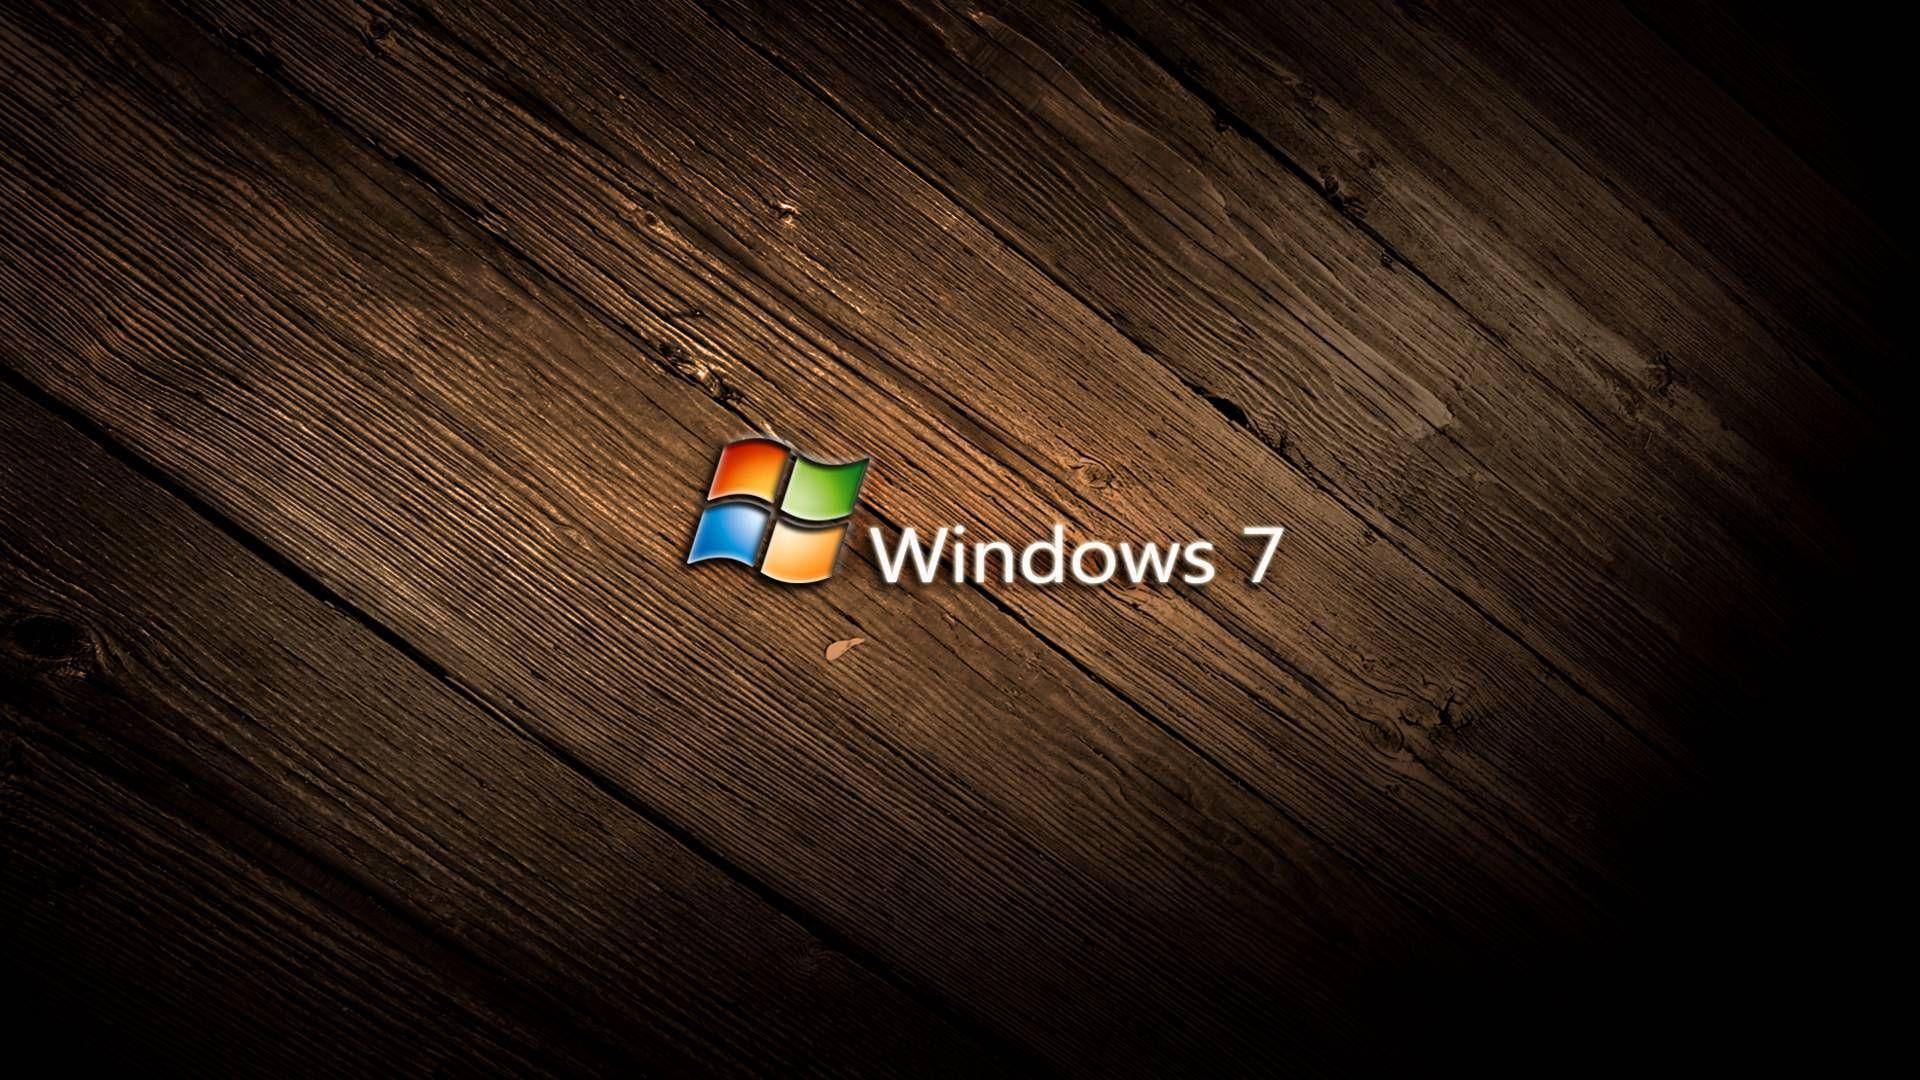 10 Most Popular Free Wallpaper For Windows 7 Full Hd 1080p For Pc Desktop Windows Wallpaper Free Desktop Wallpaper Windows Desktop Wallpaper